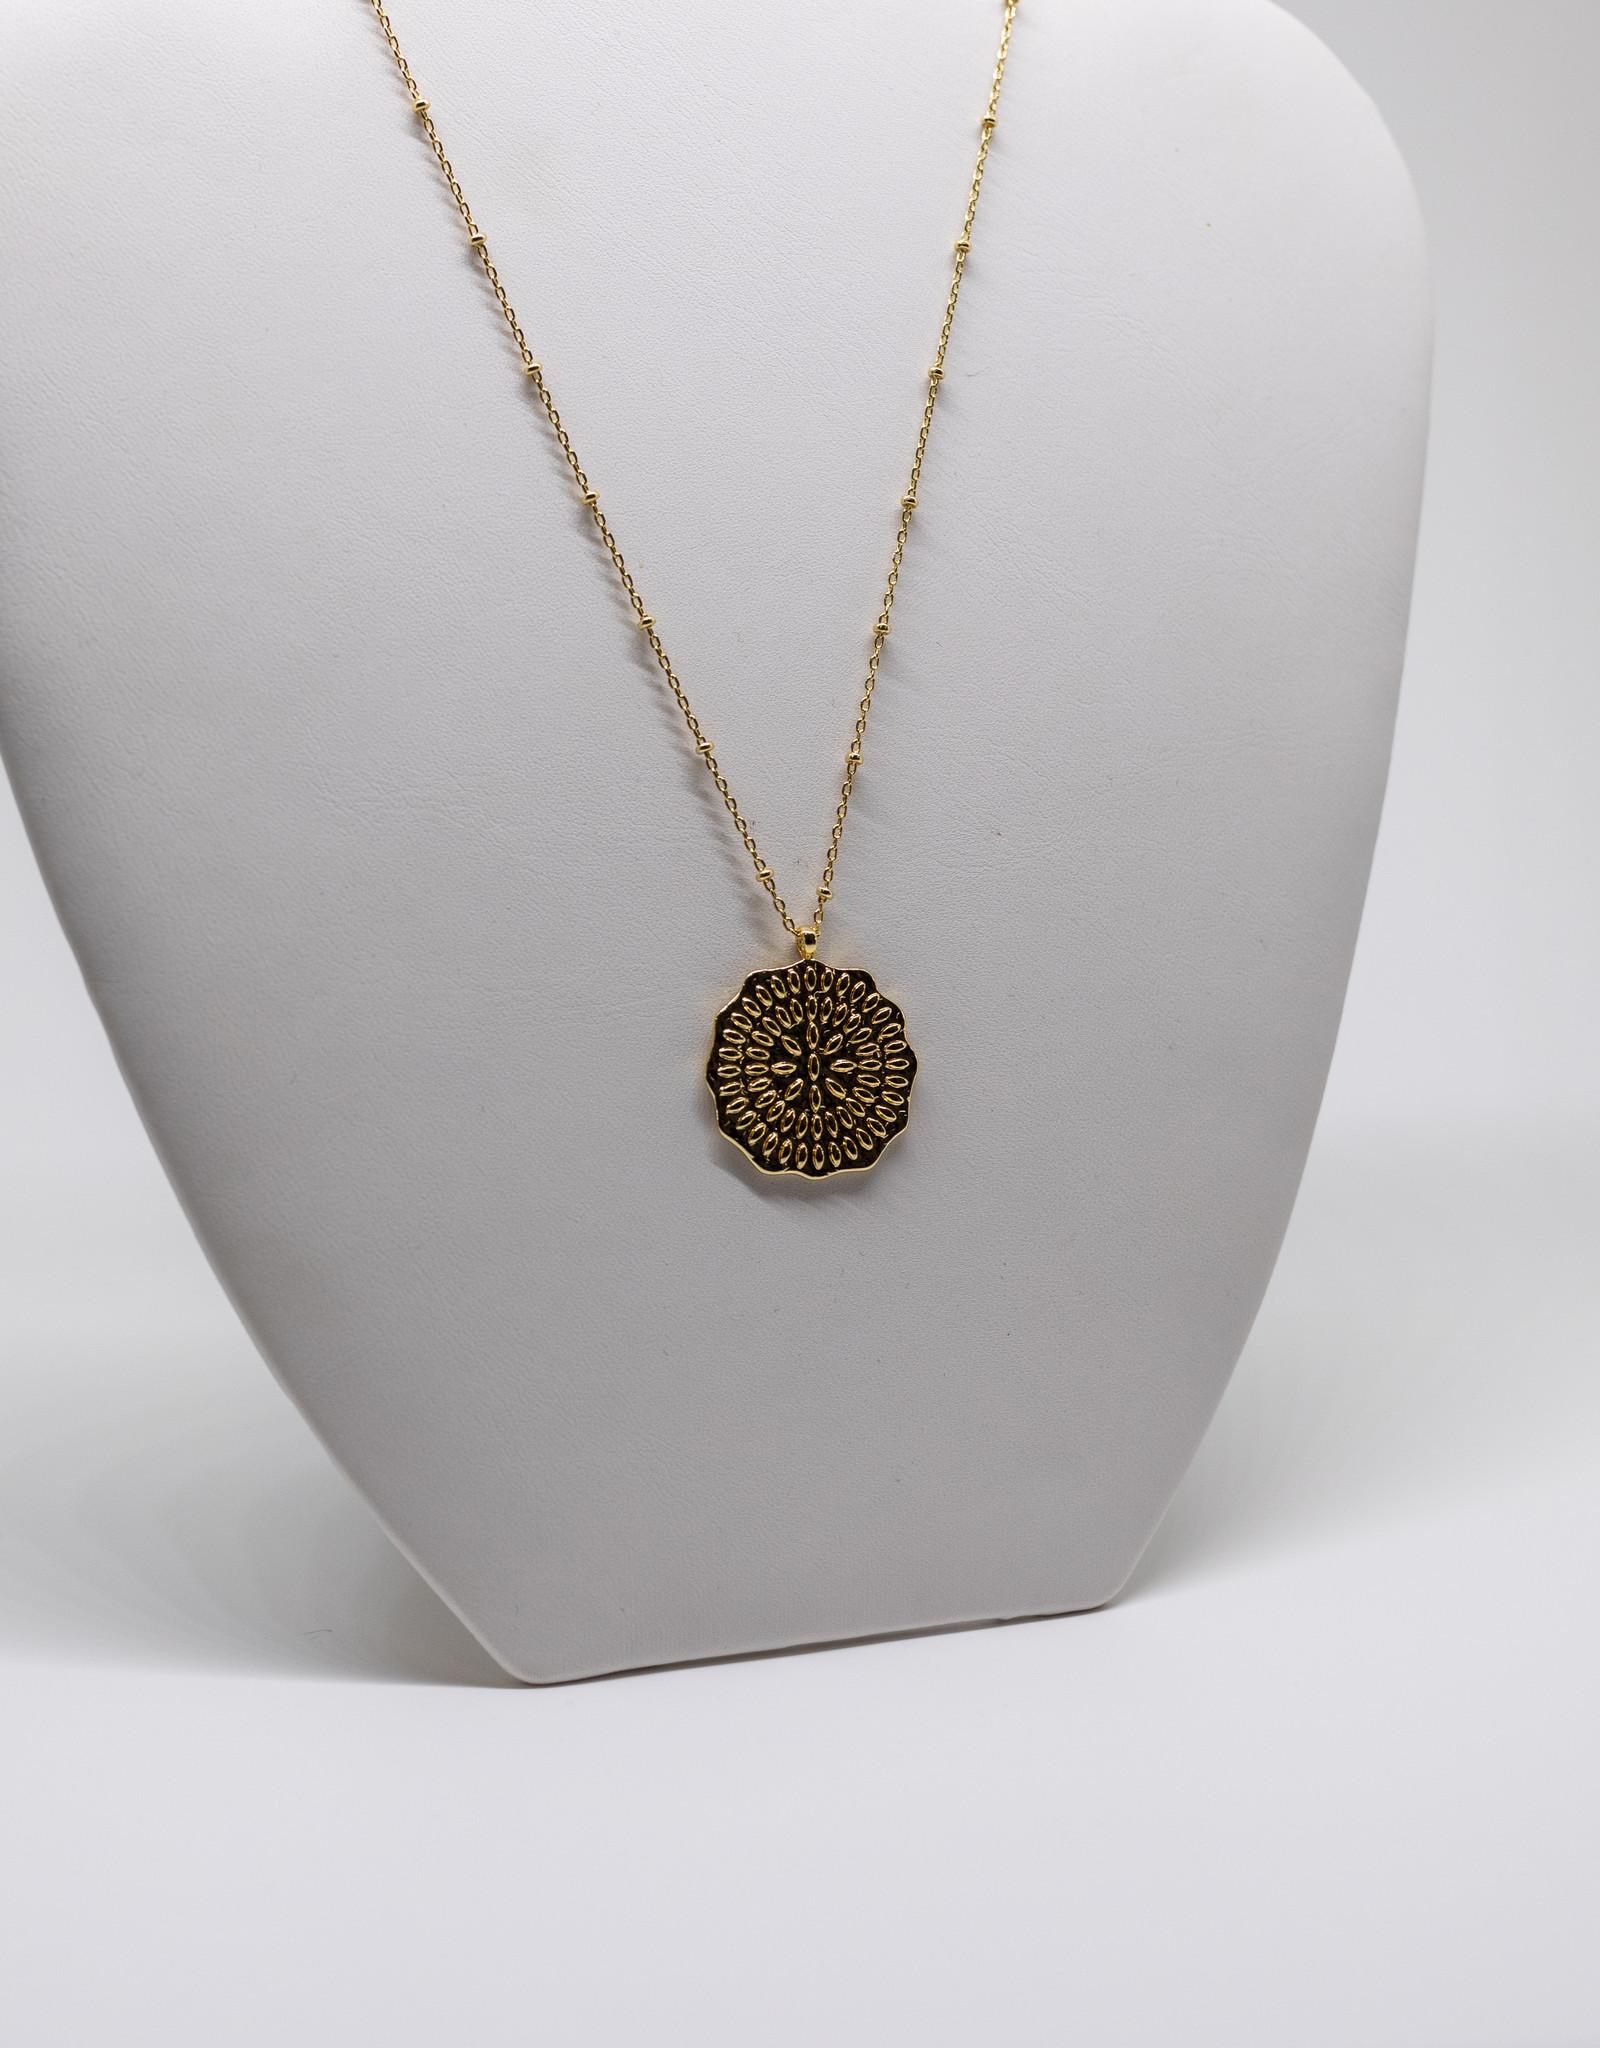 Gorjana Mosaic Coin Neck Gold